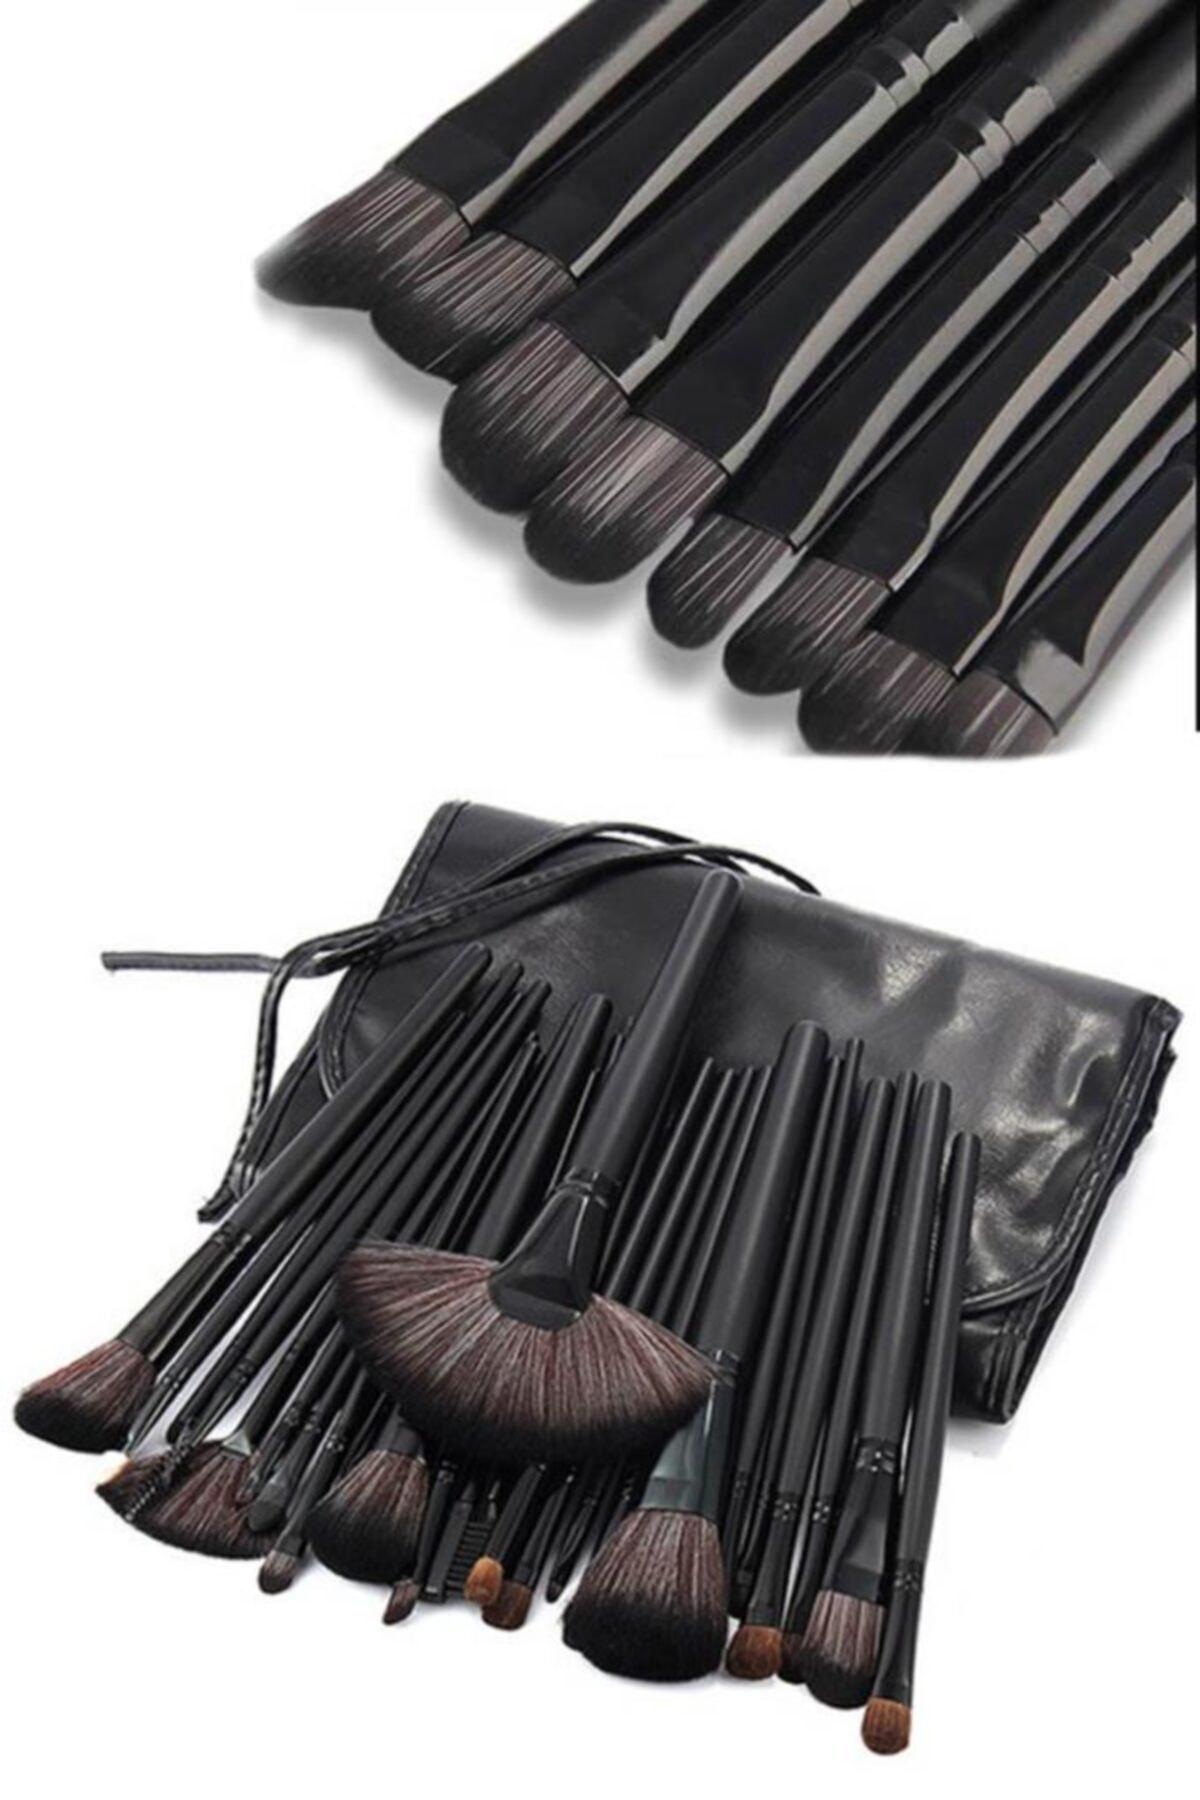 24'lü Profesyonel Makyaj Fırça Seti Siyah Renk